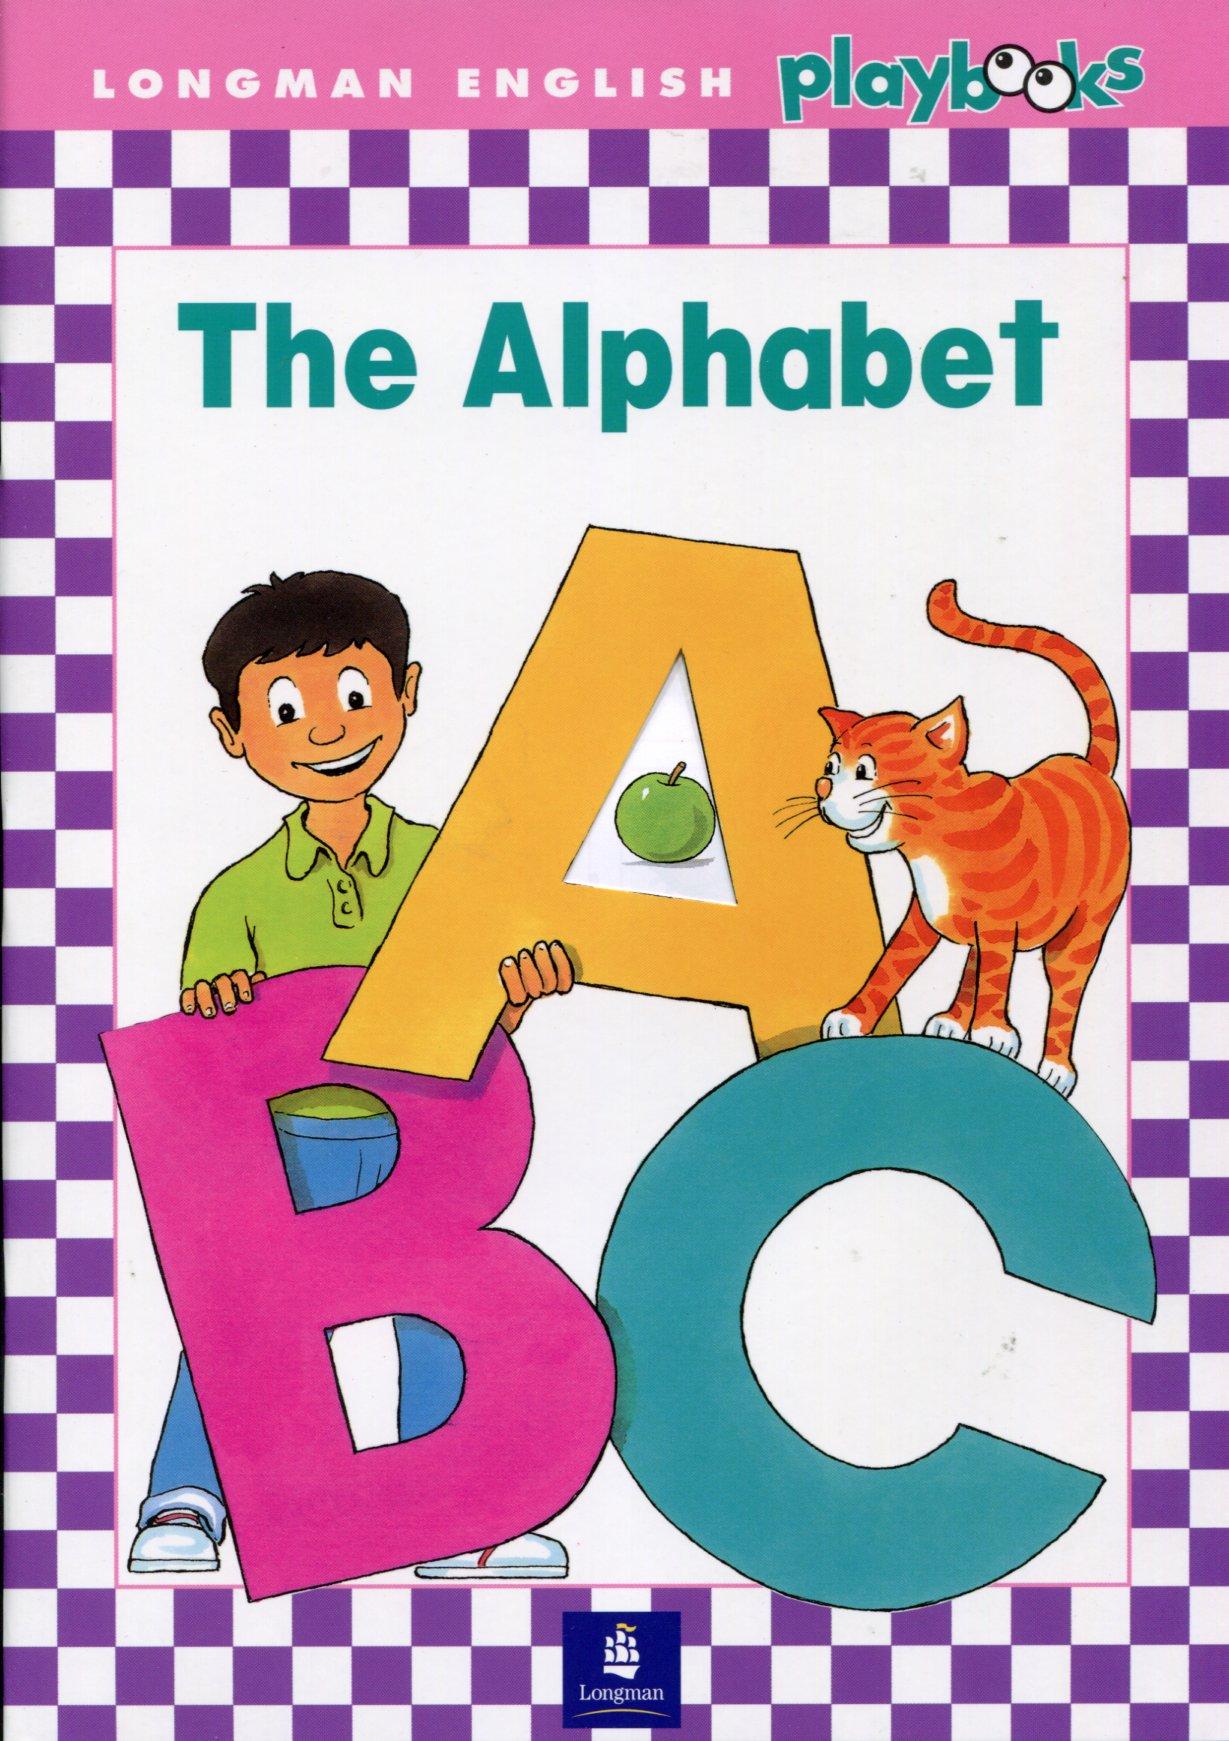 Longman English Playbooks: The Alphabet